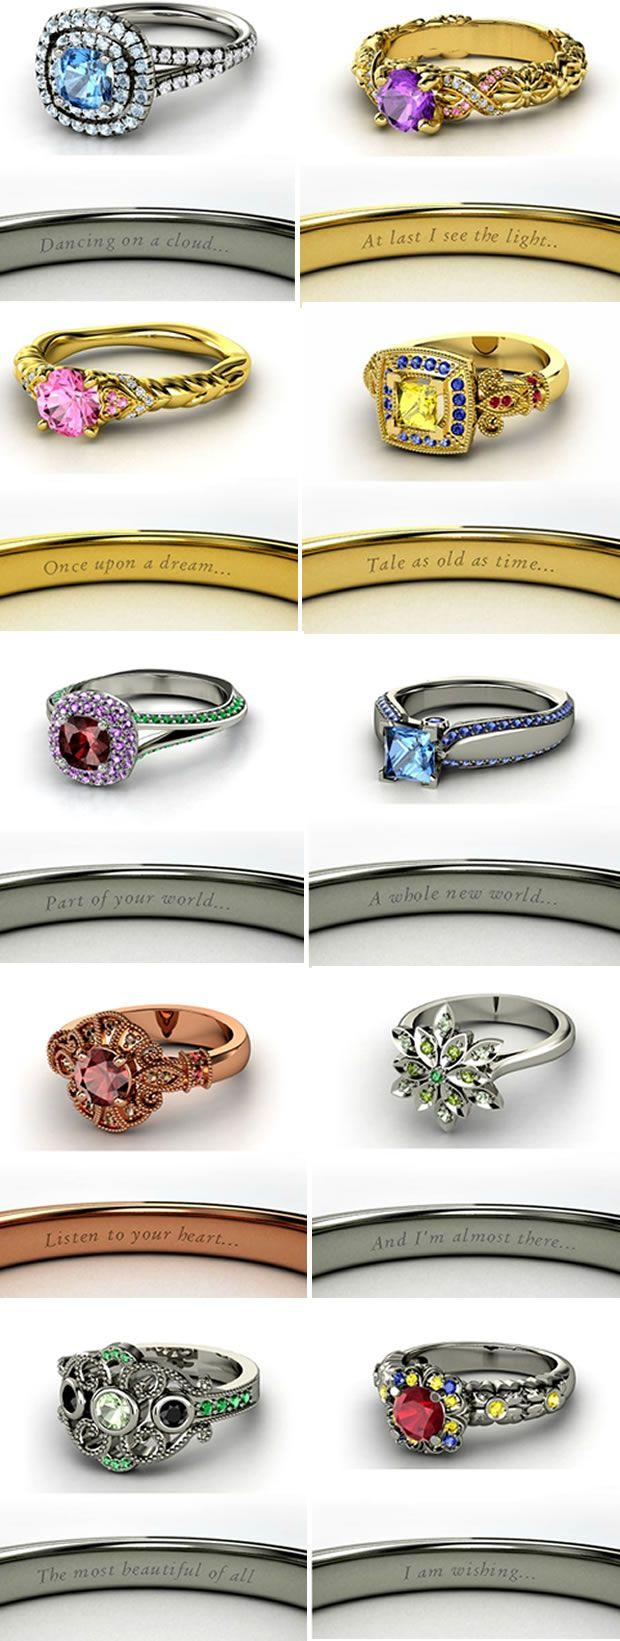 disney princess engagement rings sleeping beauty source